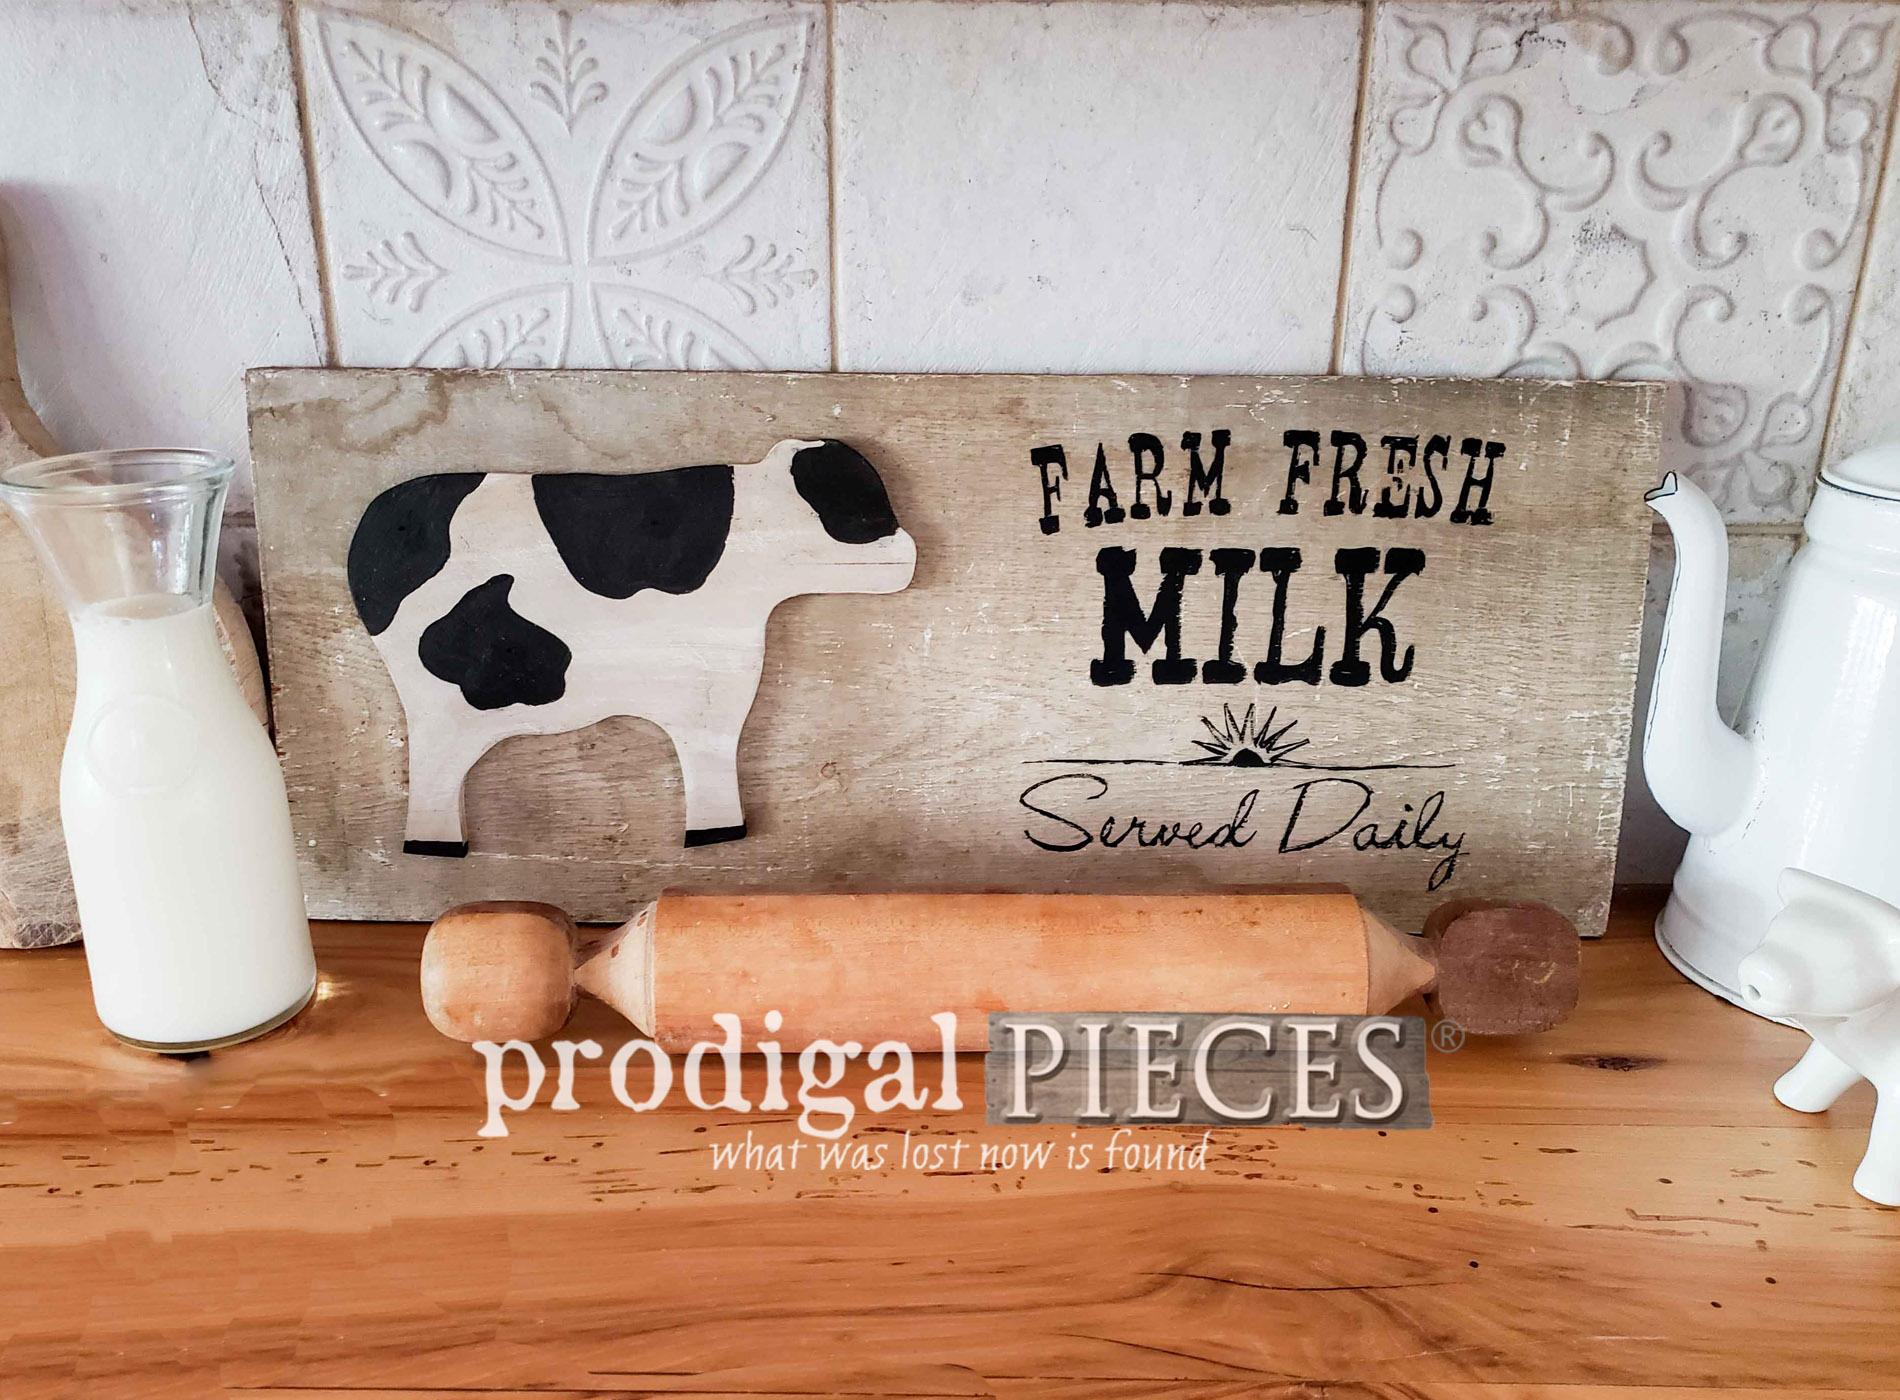 Reclaimed Barn Wood Sign With Farm Fresh Milk Served Daily